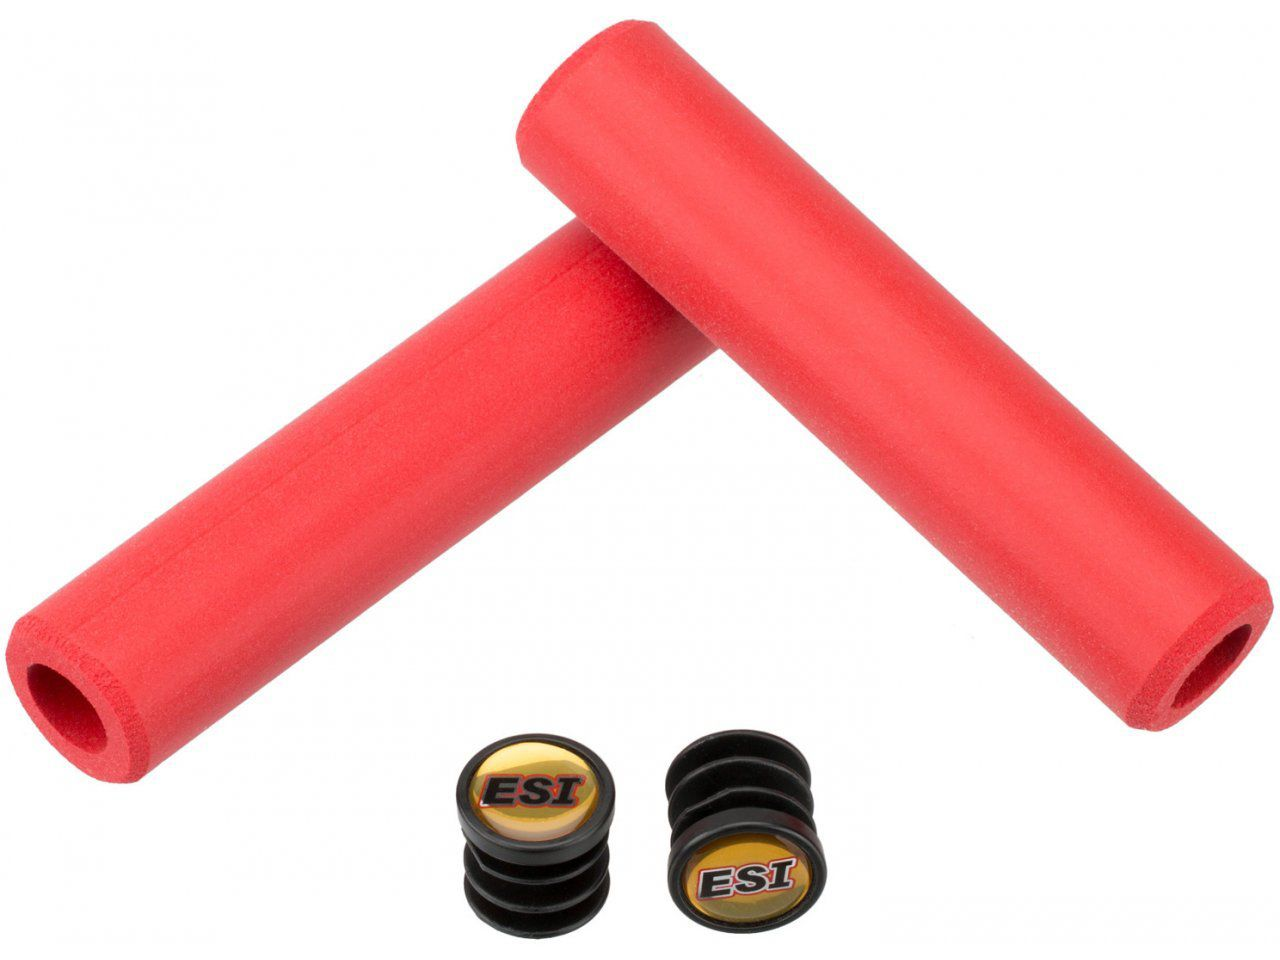 Manoplas Mtb Esi Grips Chunky 32mm Vermelha 60 Gramas